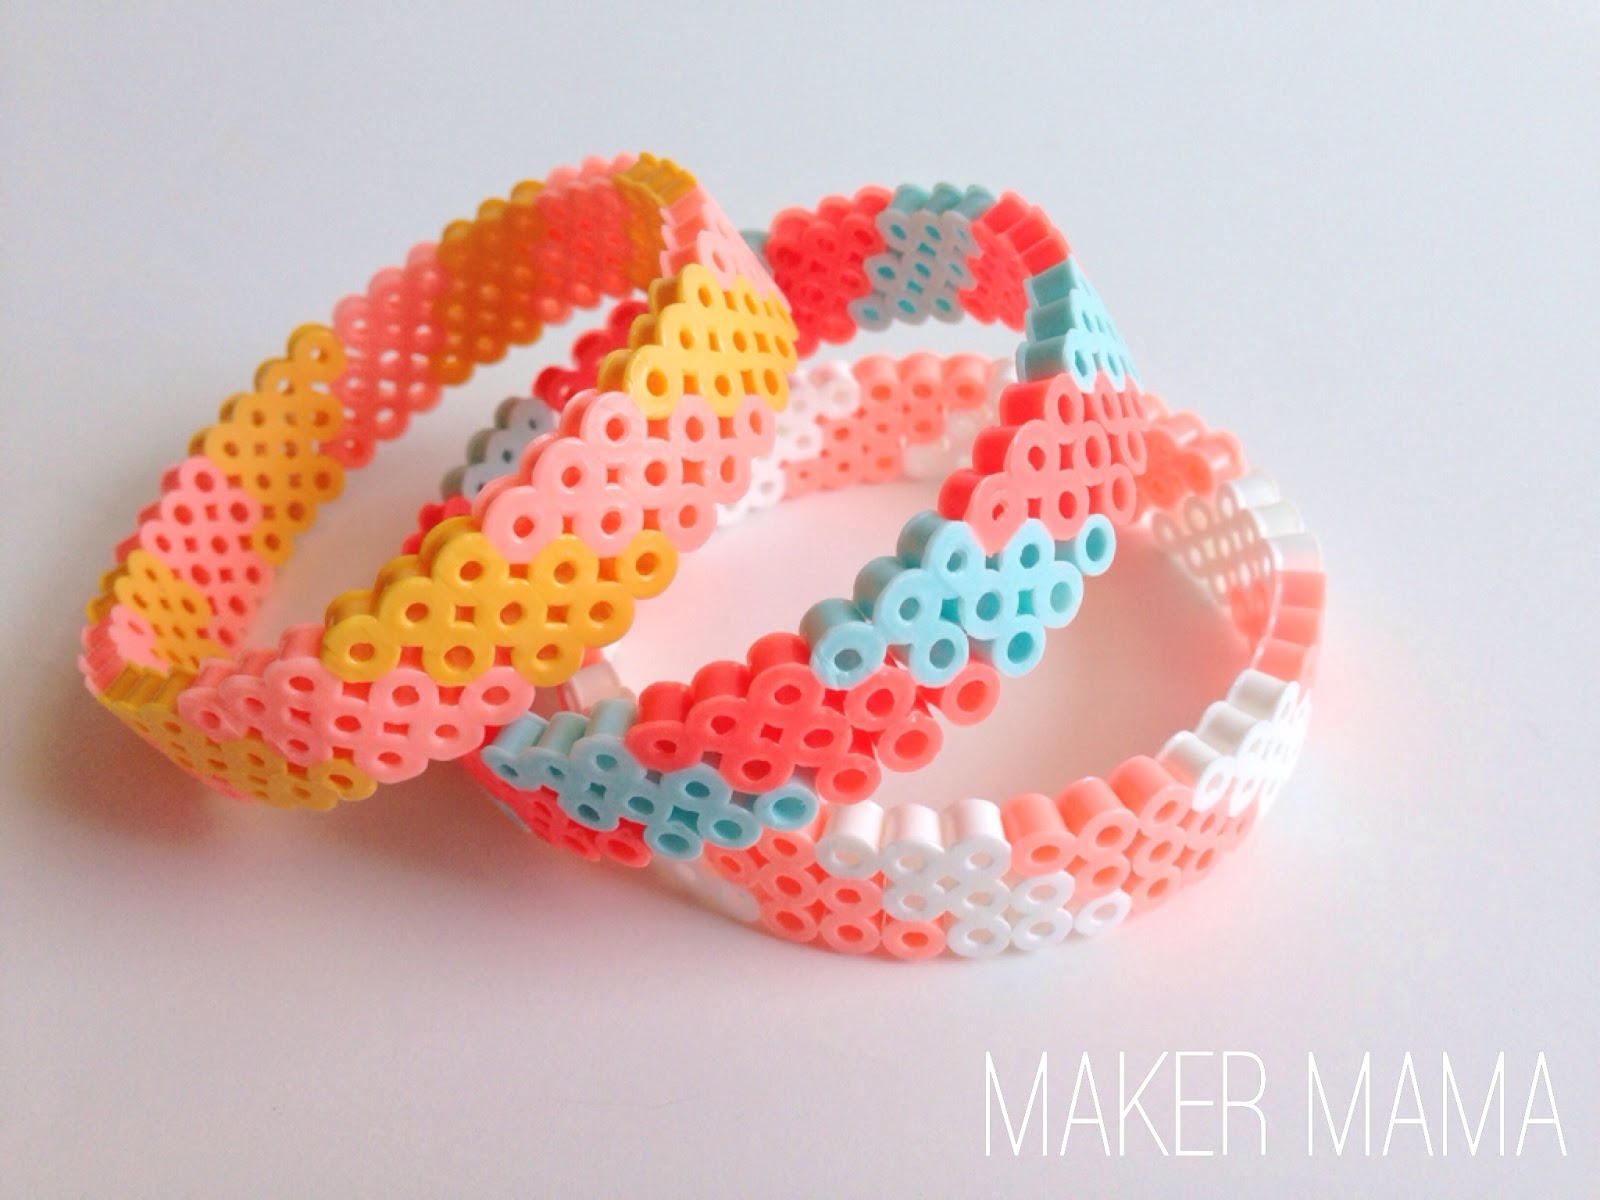 Maker mama craft blog: perler bead bracelet